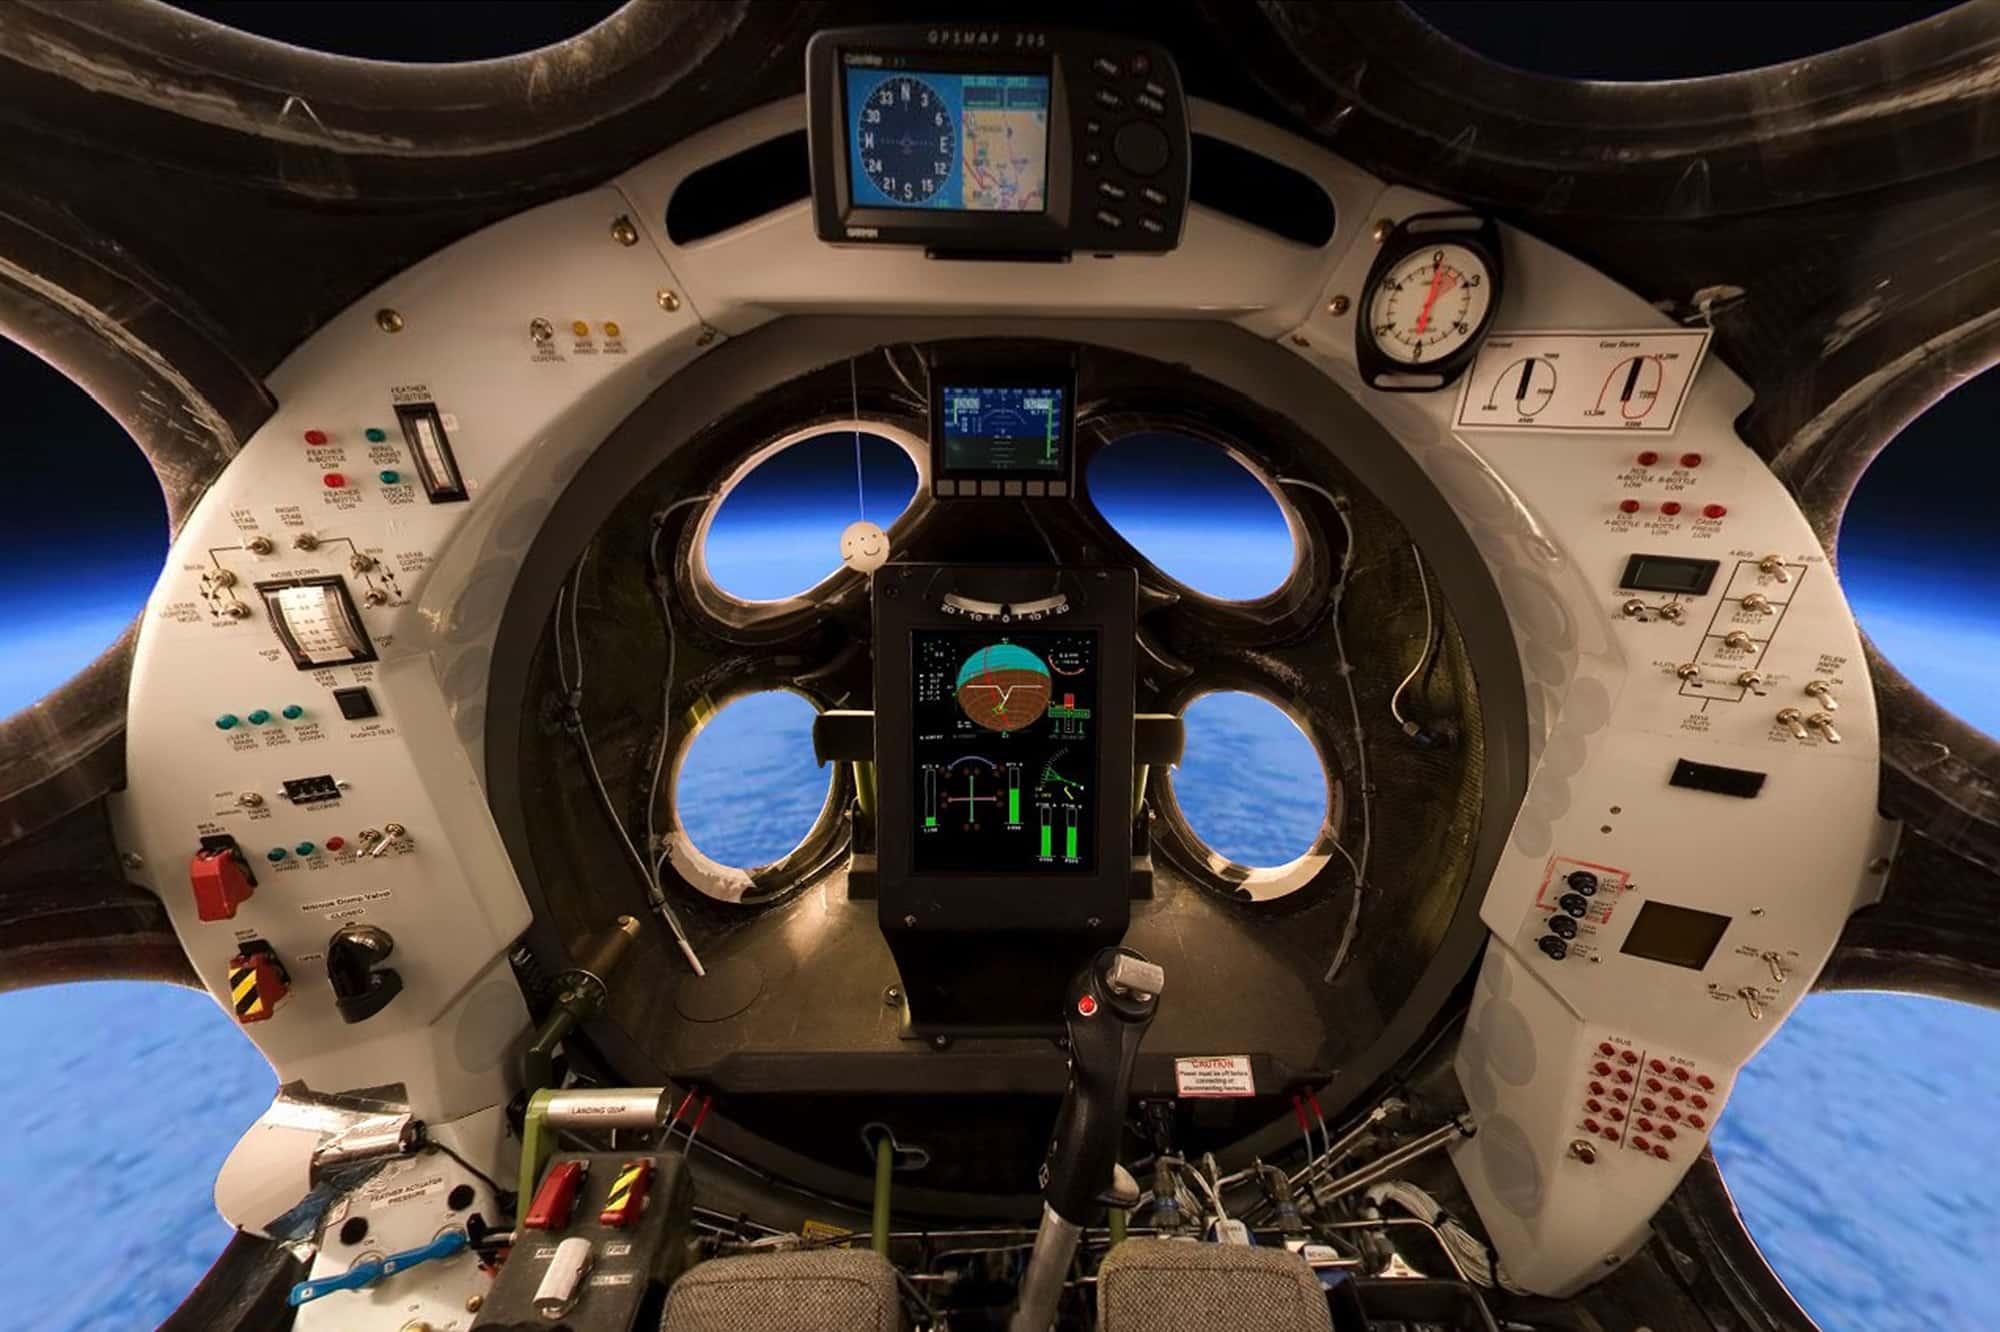 SpaceShipOne bio je eksperimentalni stroj kompanije Virgin Galactic (Credit: Light Media)